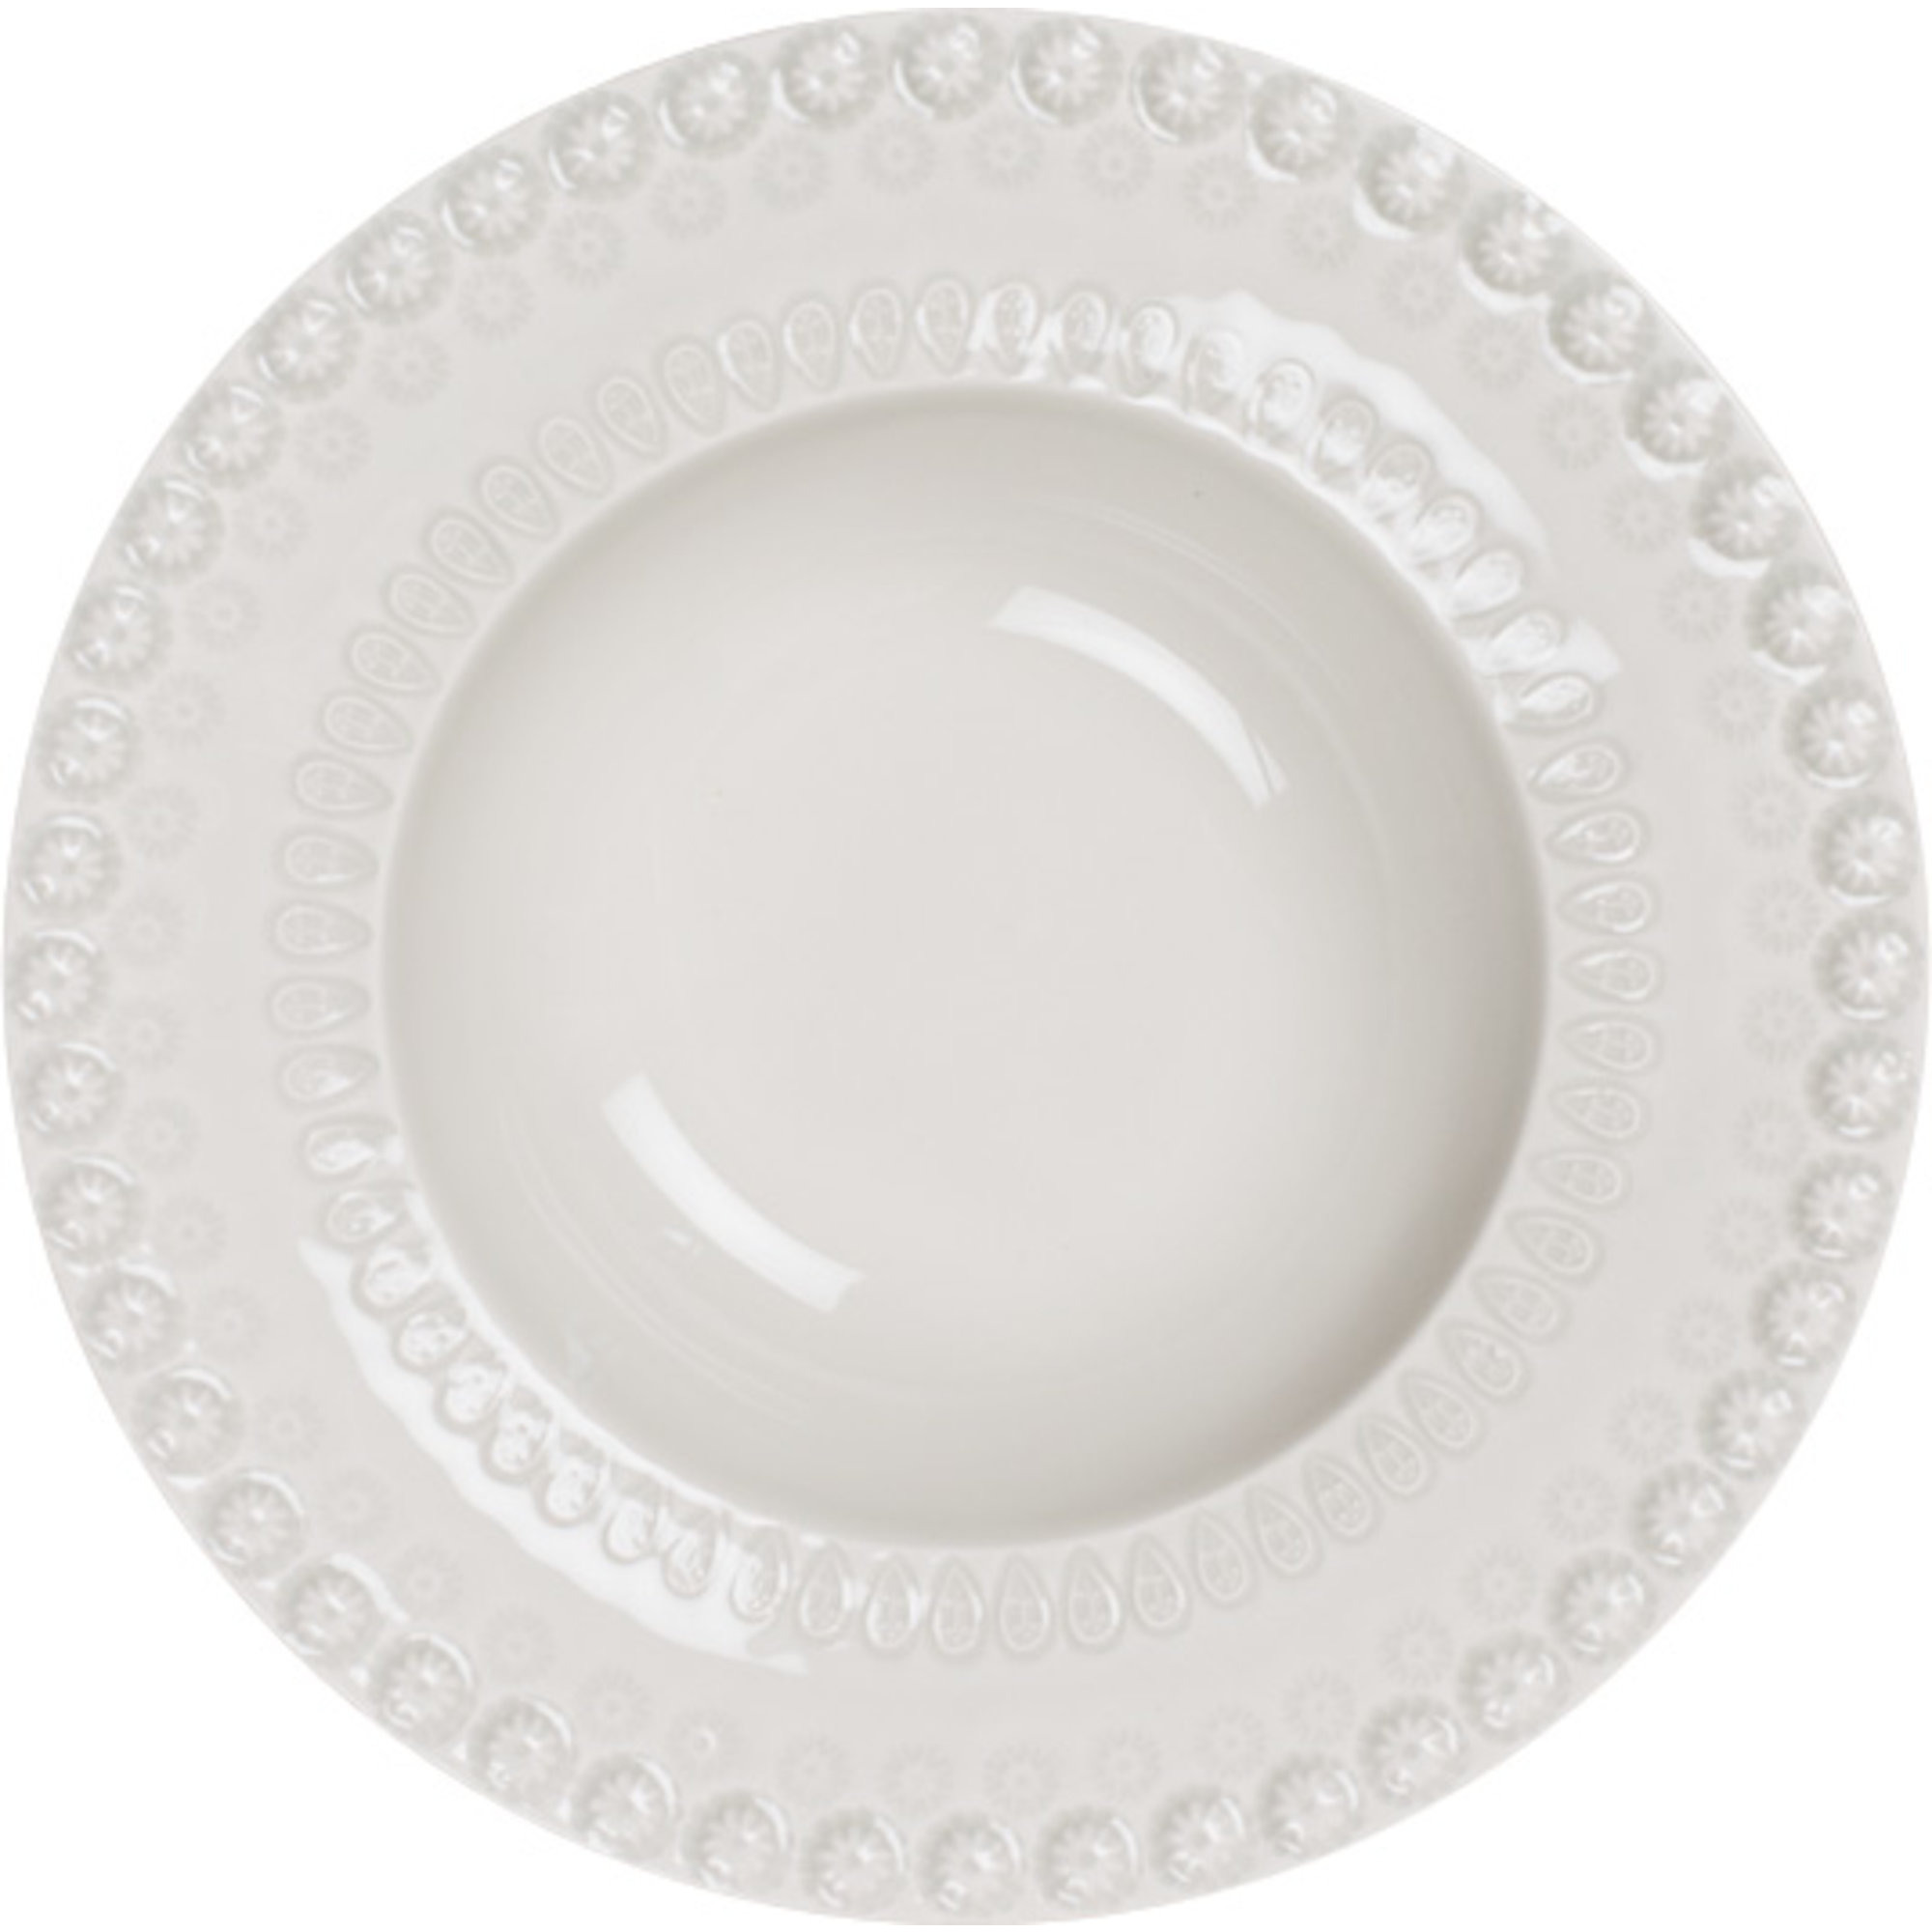 PotteryJo Daisy Soppskål 21 cm Kit